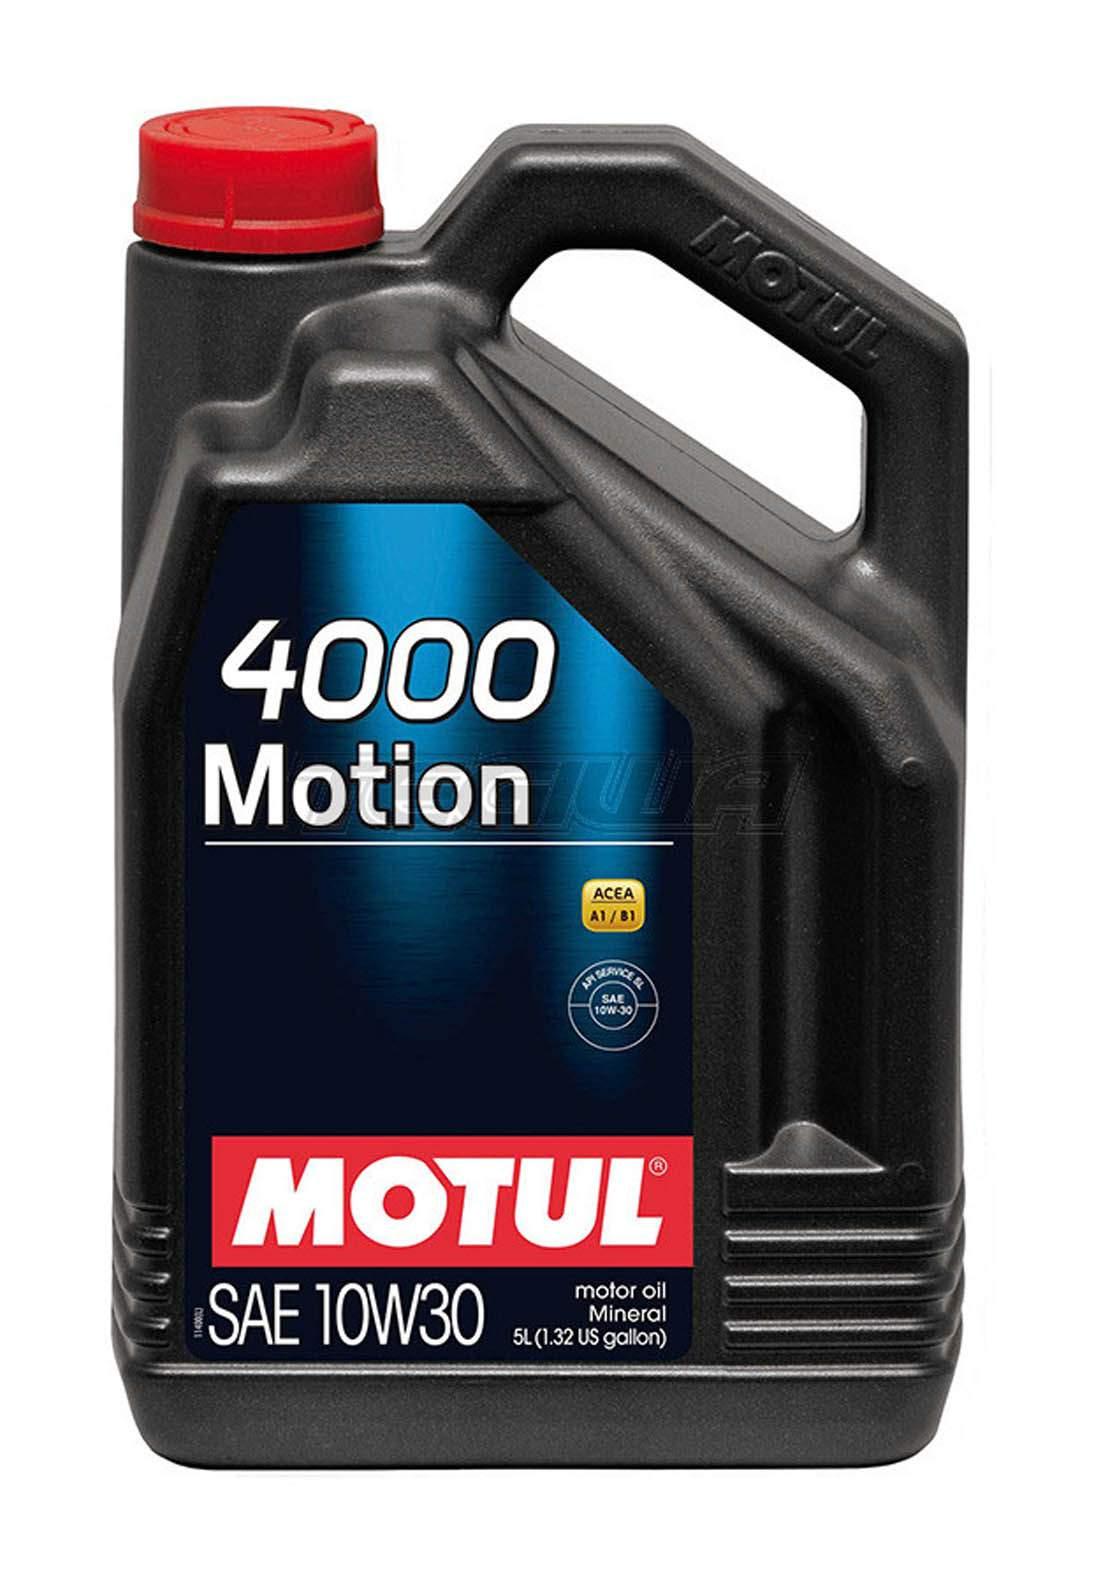 Motul 10w30 400 Motion  Mineral Automotive oil 5L زيت معدني للسيارات